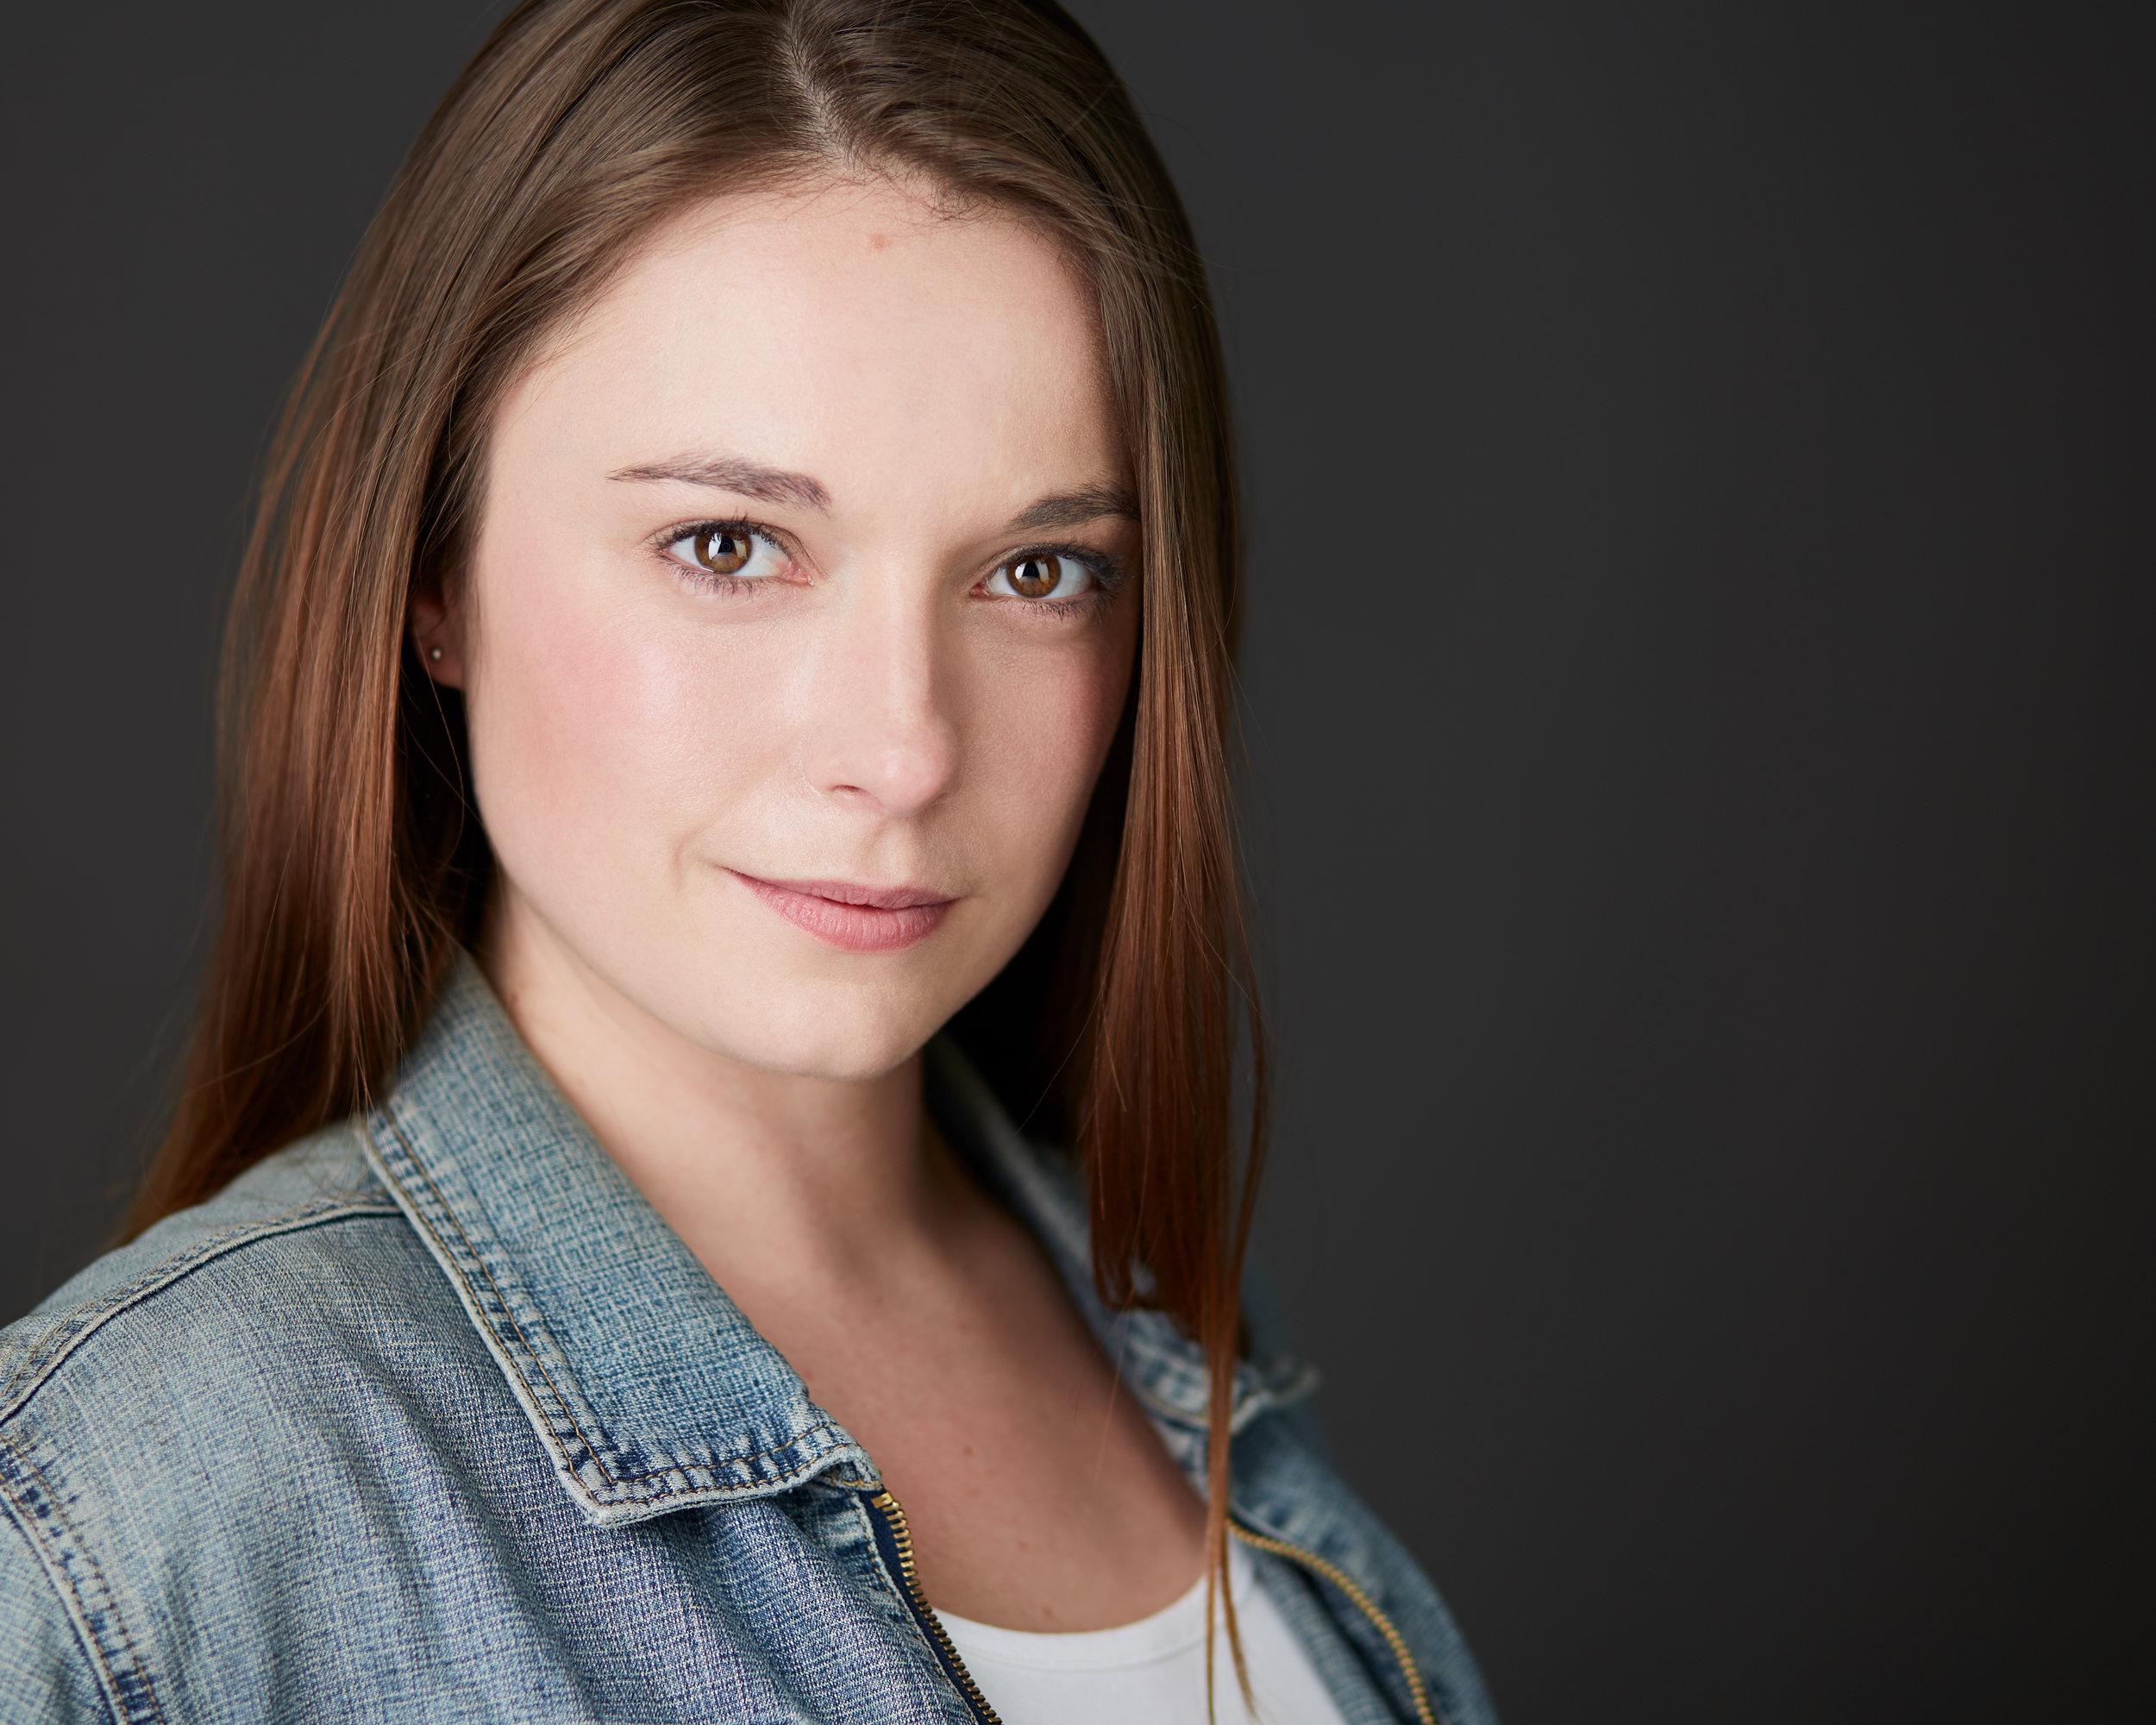 Miranda Poett as Titus